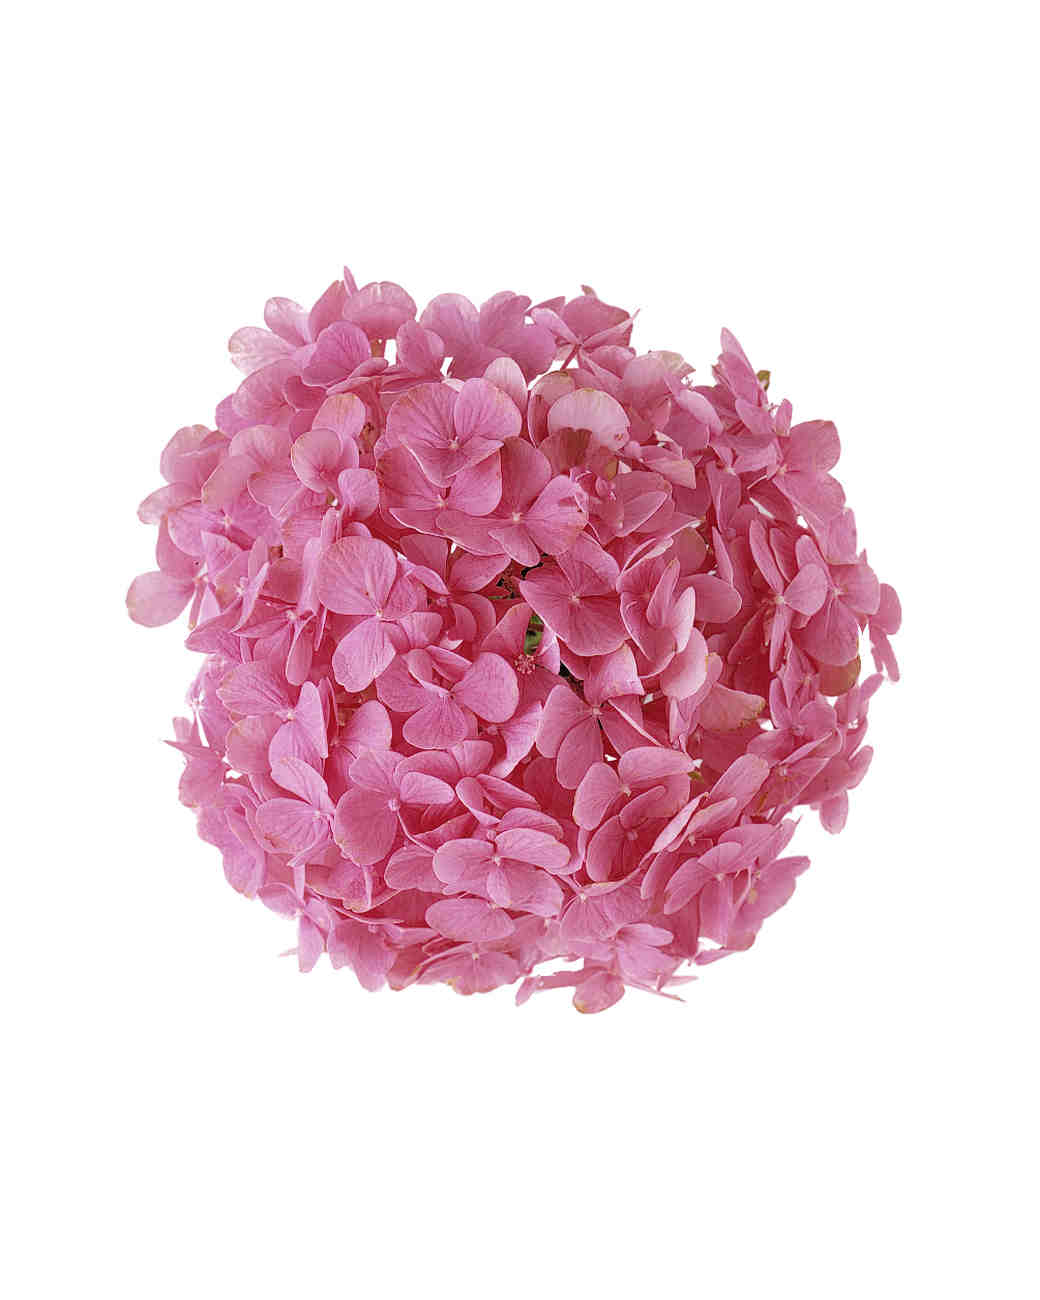 flower-glossary-hydrangea-pink-a98432-0415.jpg